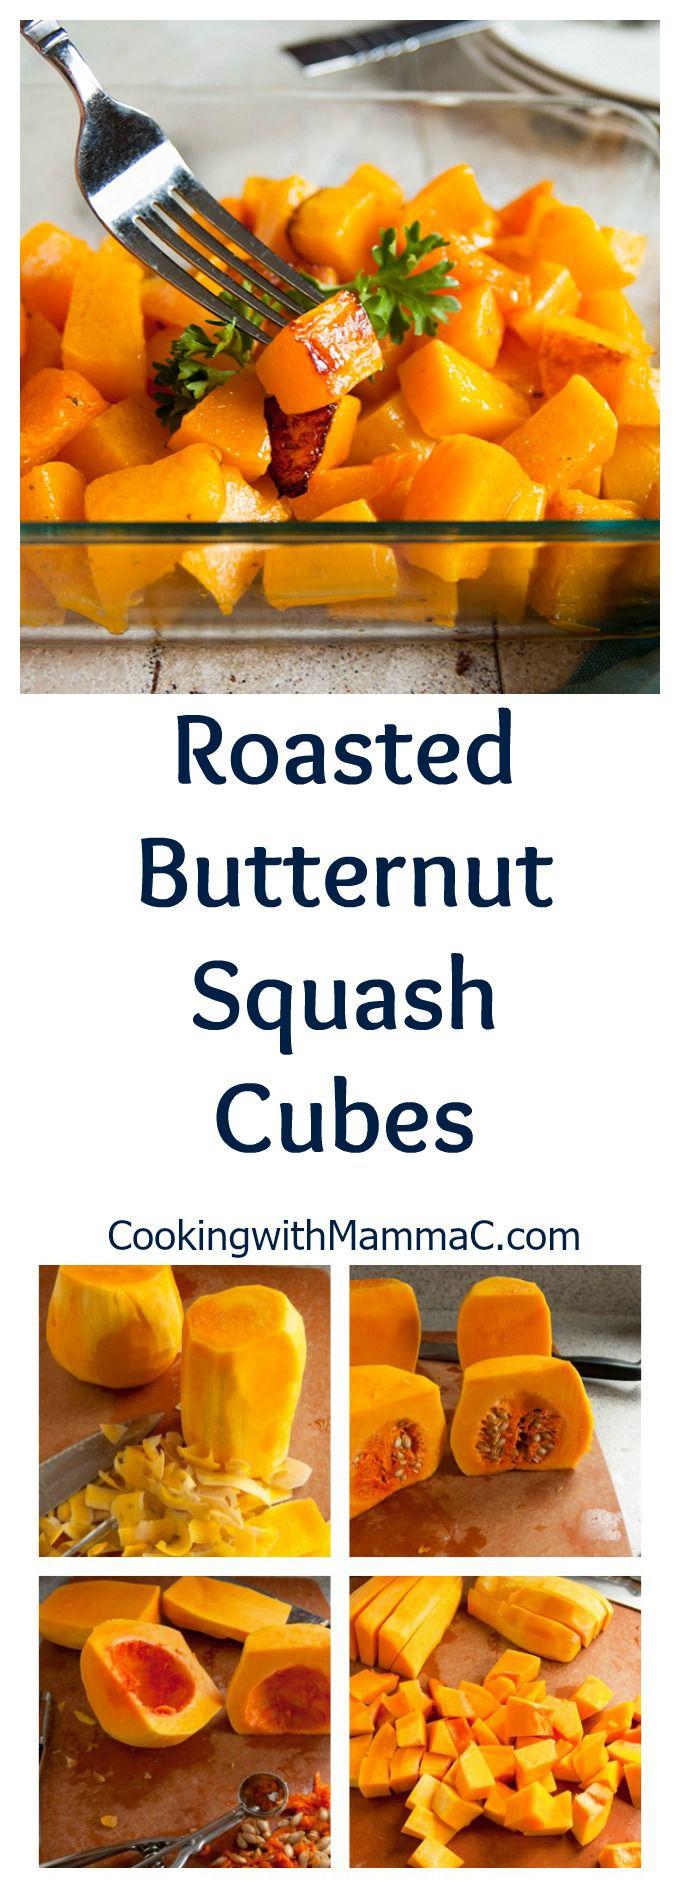 Roasted Butternut Squash Cubes - A delicious side dish recipe | Vegan | How to cut butternut squash | How to roast butternut squash | Gluten free